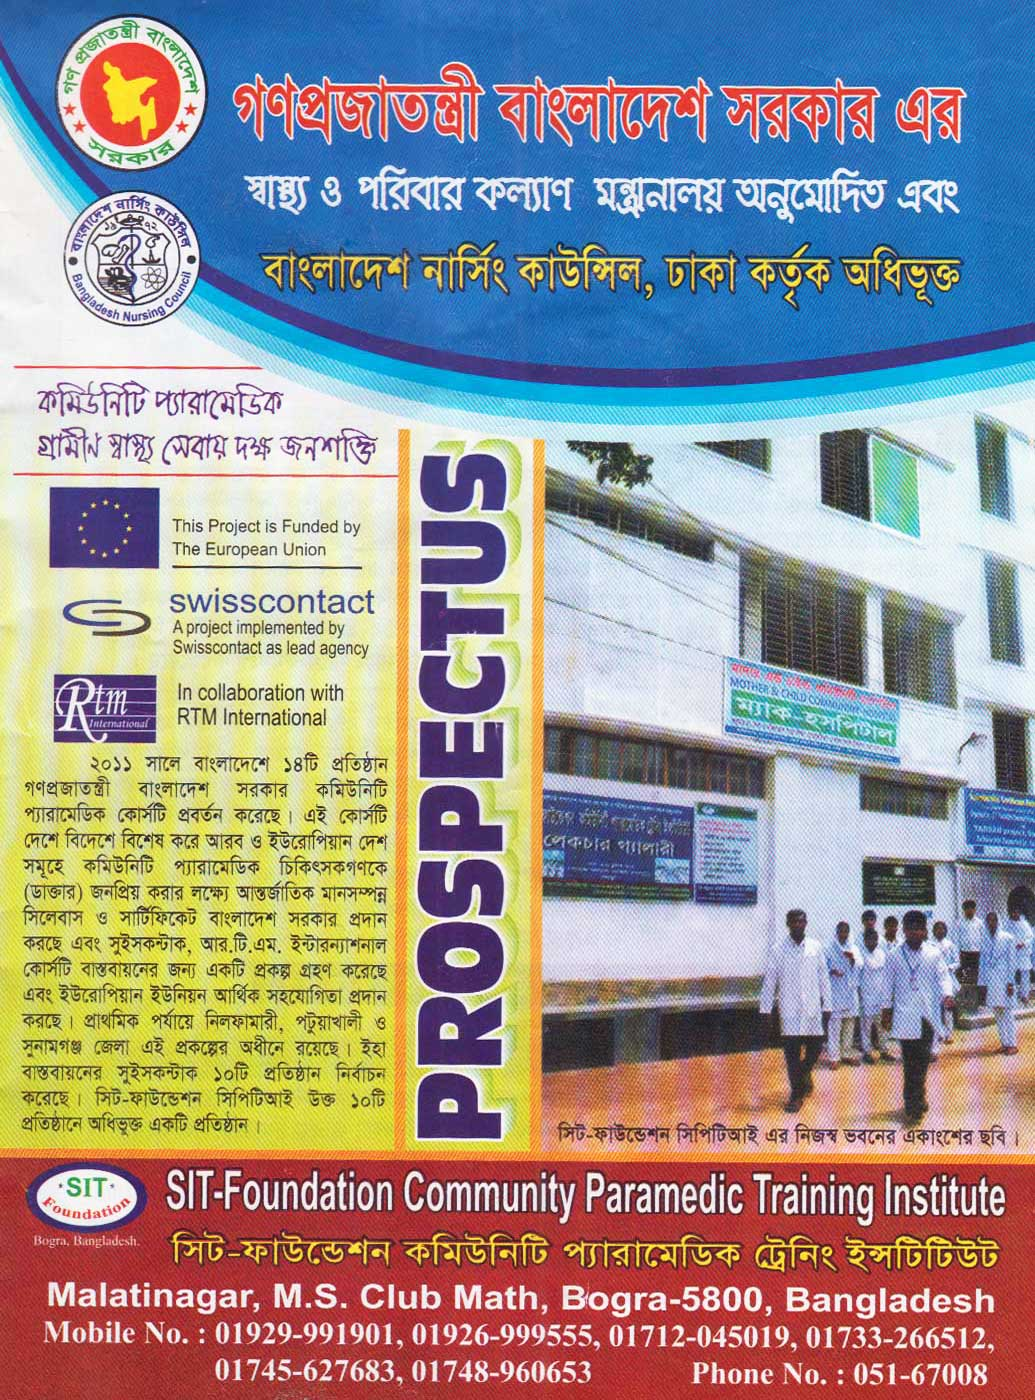 SIT-Foundation CPTI